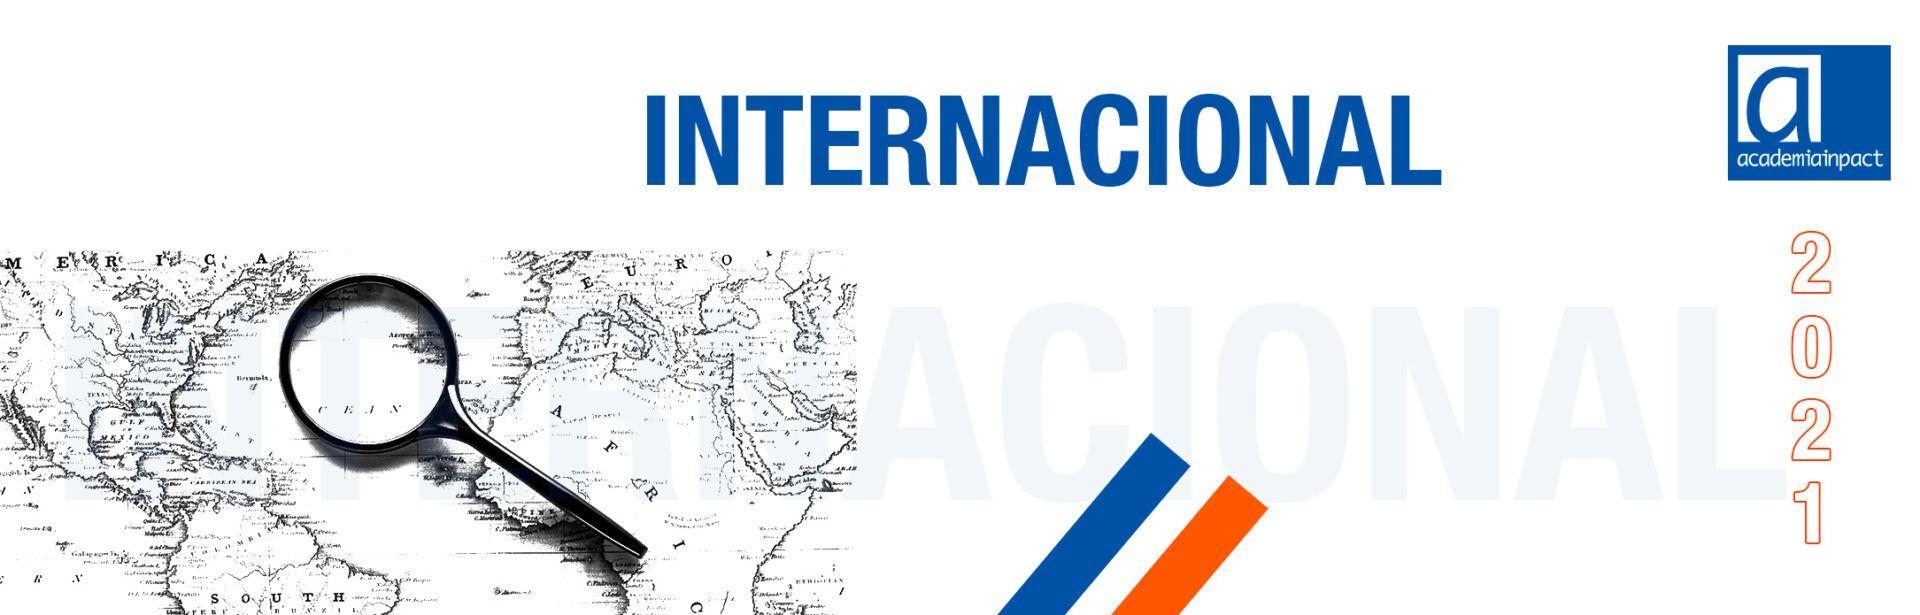 banner-internacional3